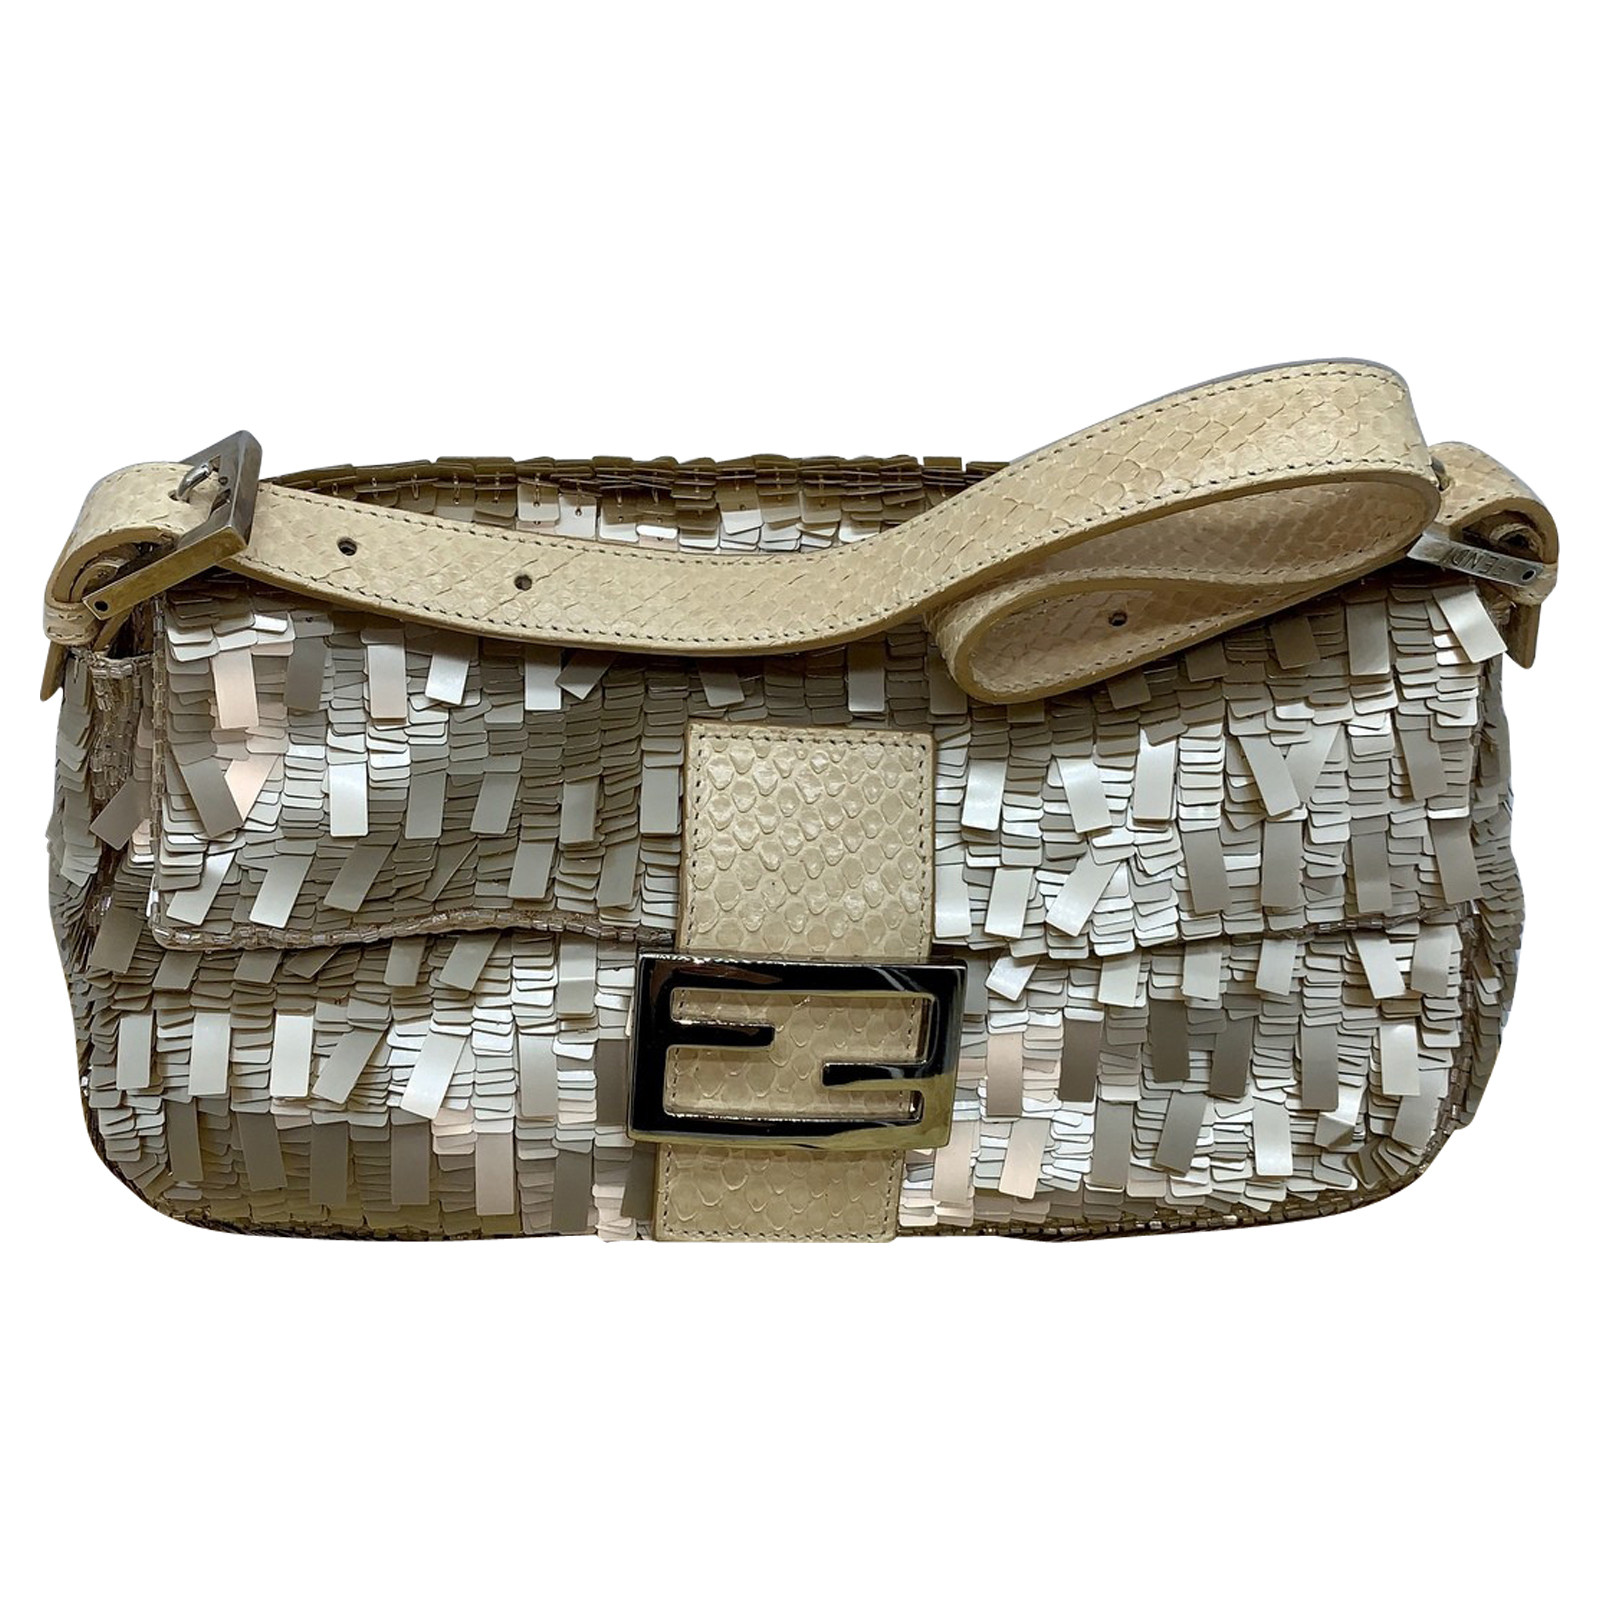 Fendi Baguette Bag in Nude Second Hand Fendi Baguette Bag